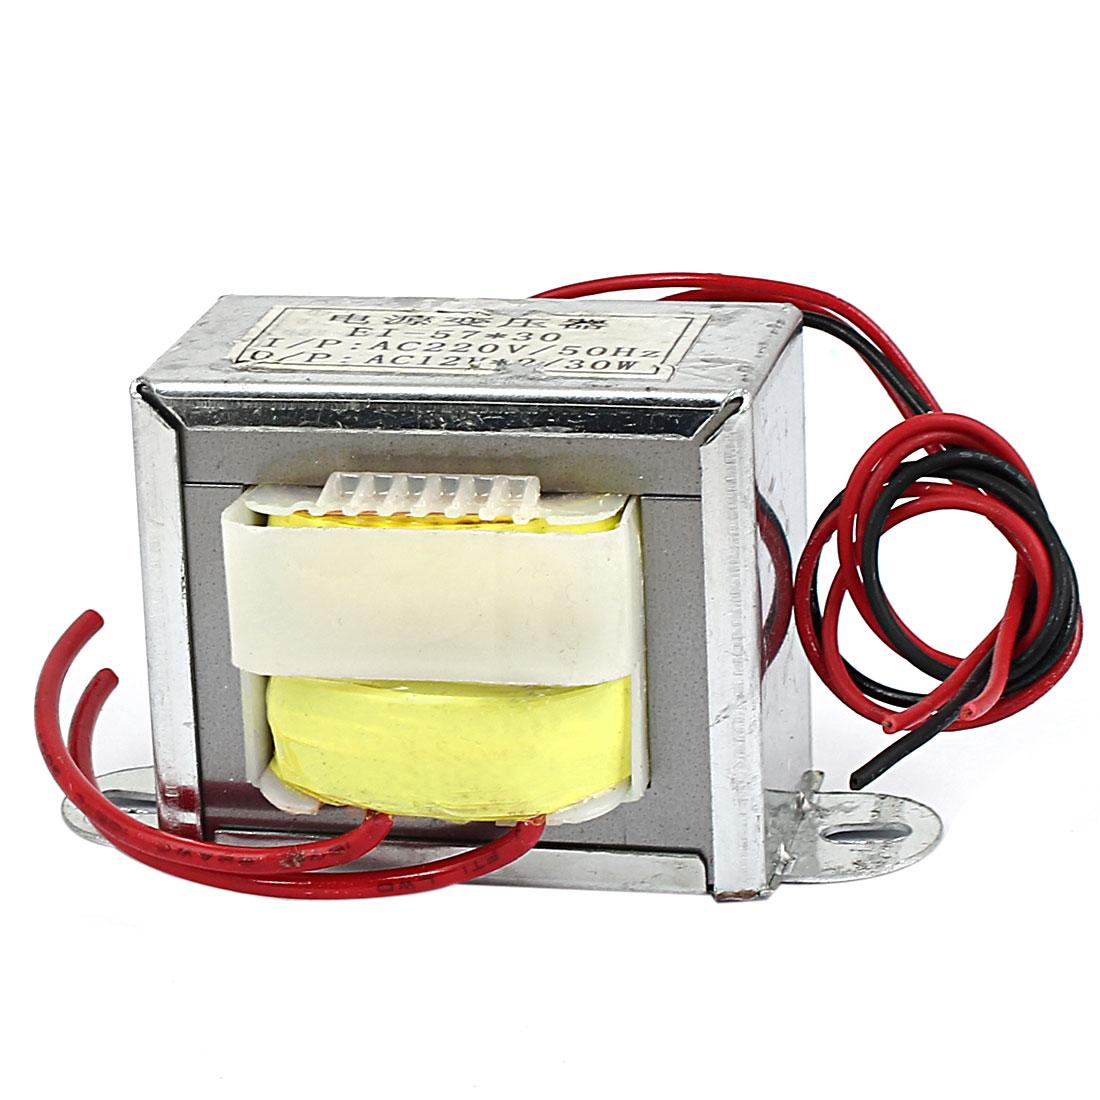 220V 50Hz Input 12V 30W Output Vertical Mount EI Core Power Transformer